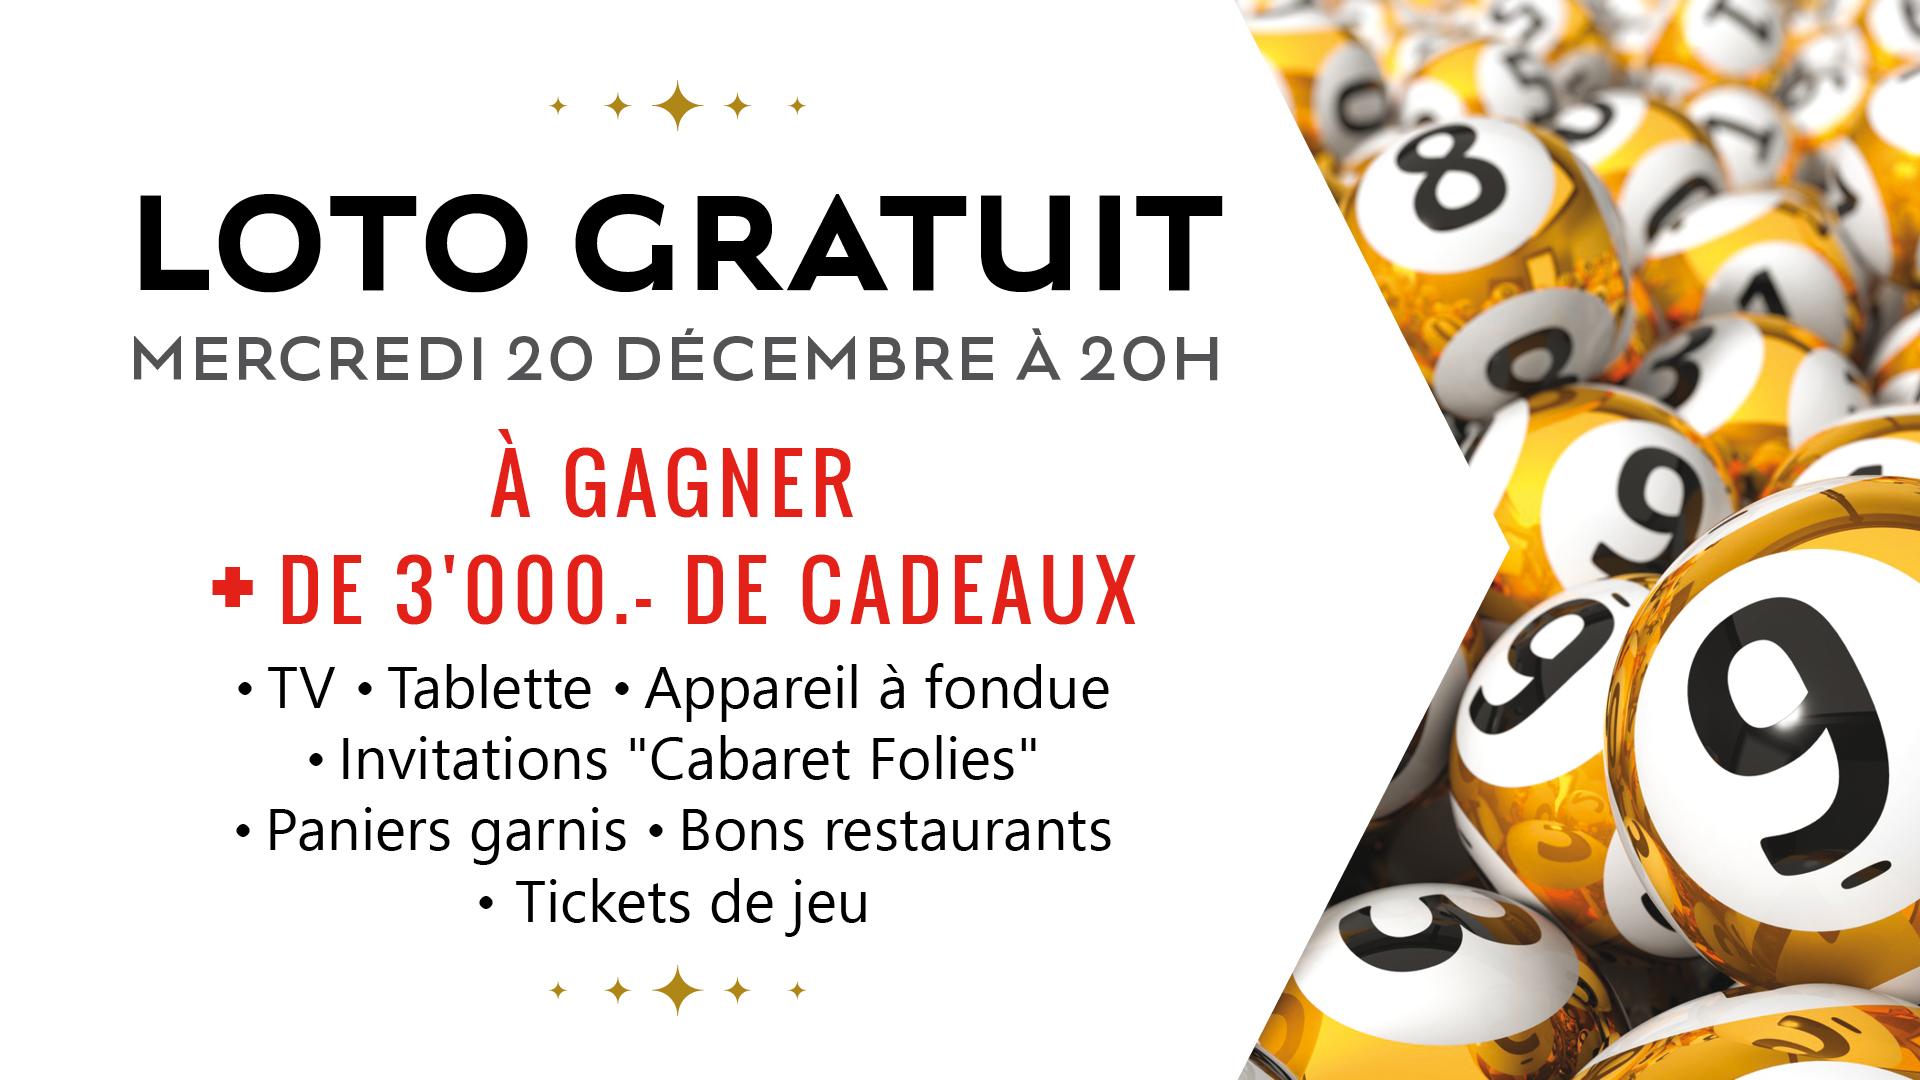 Loto gratuit casino montreux casino statistics usage webalizer webstats